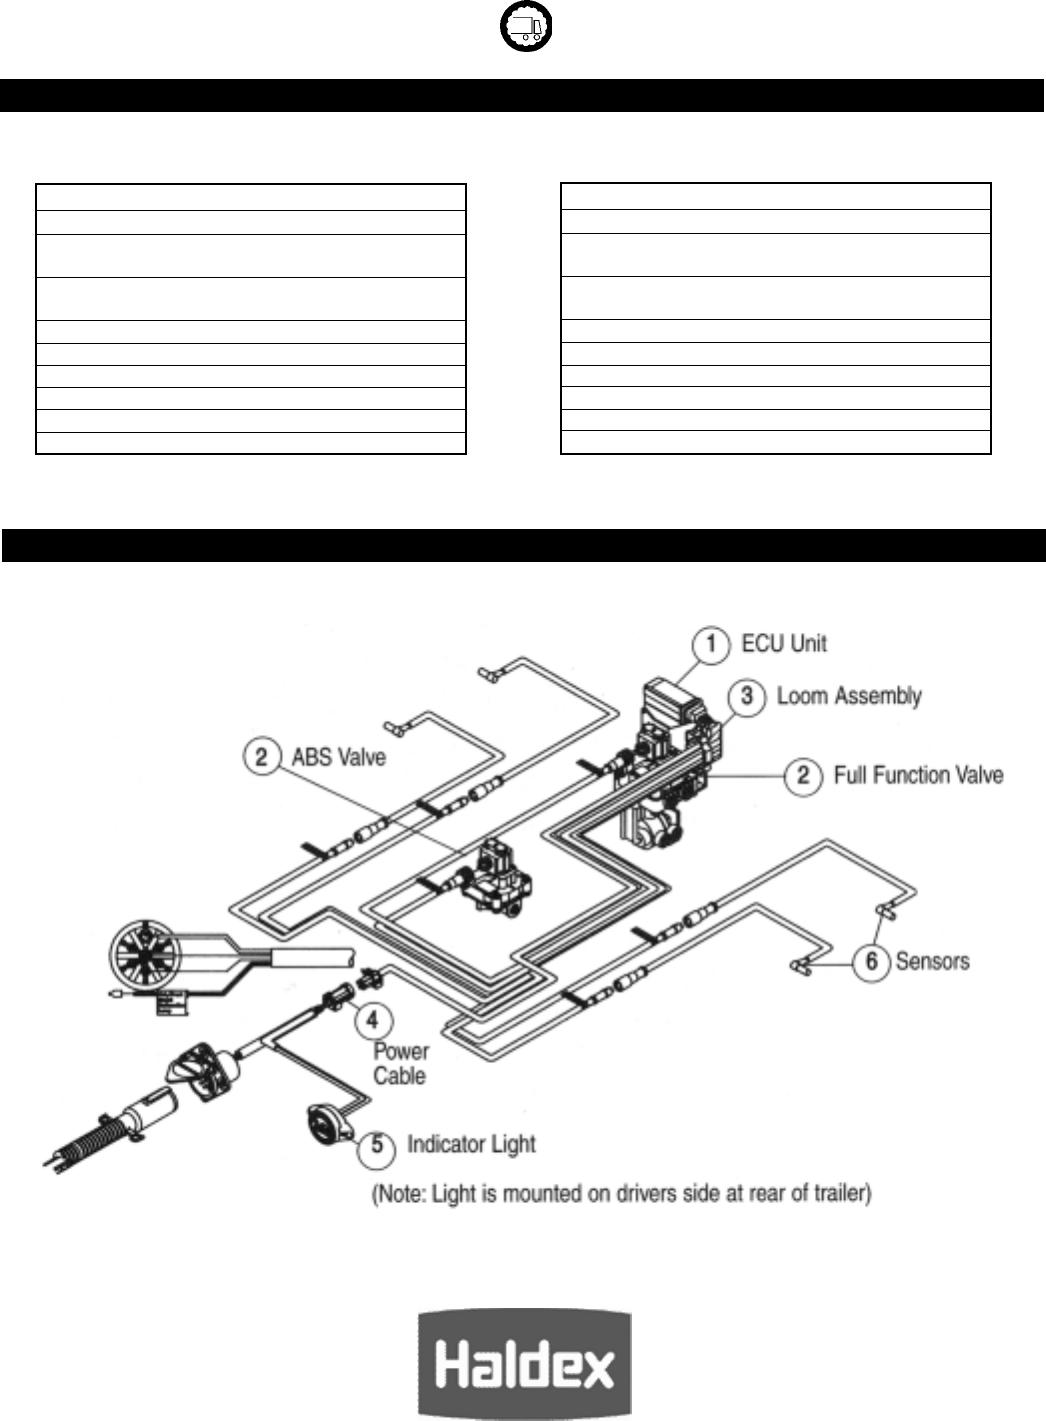 Haldex Trailer Ebs Wiring Diagram. Trailer Battery Diagram ... on